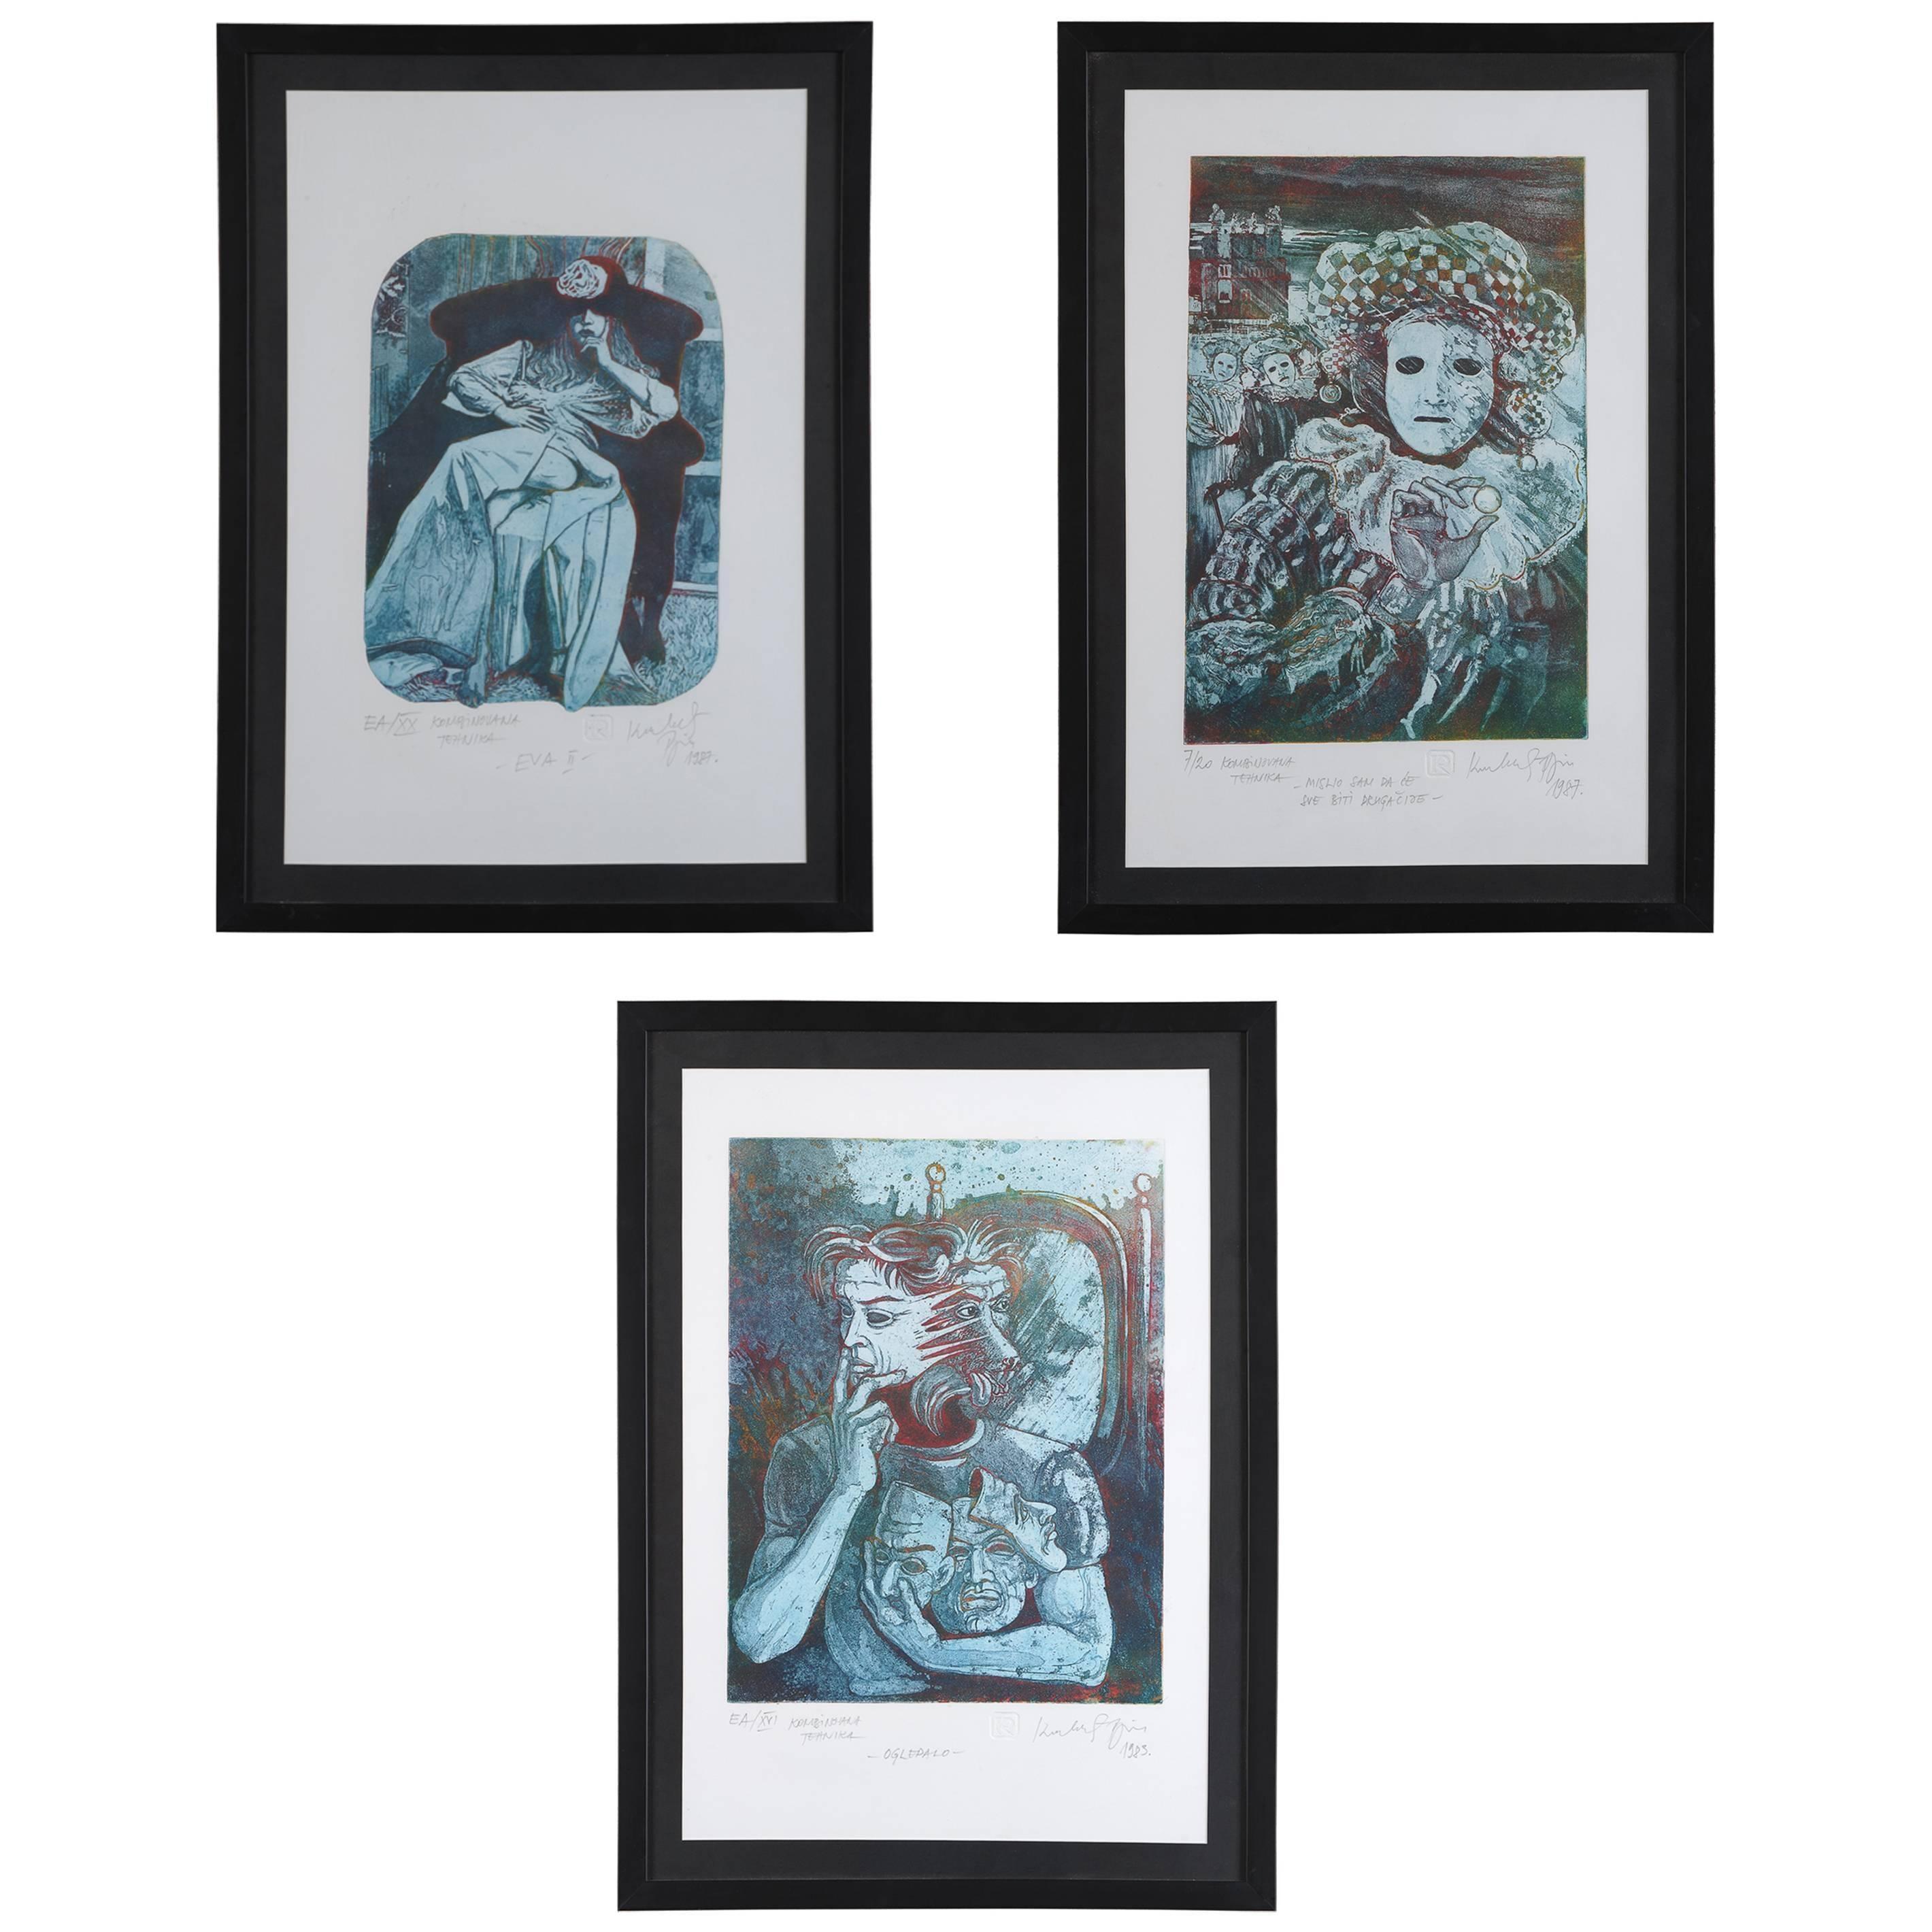 Trilogy Aquatinta by Rajko Kovacevic